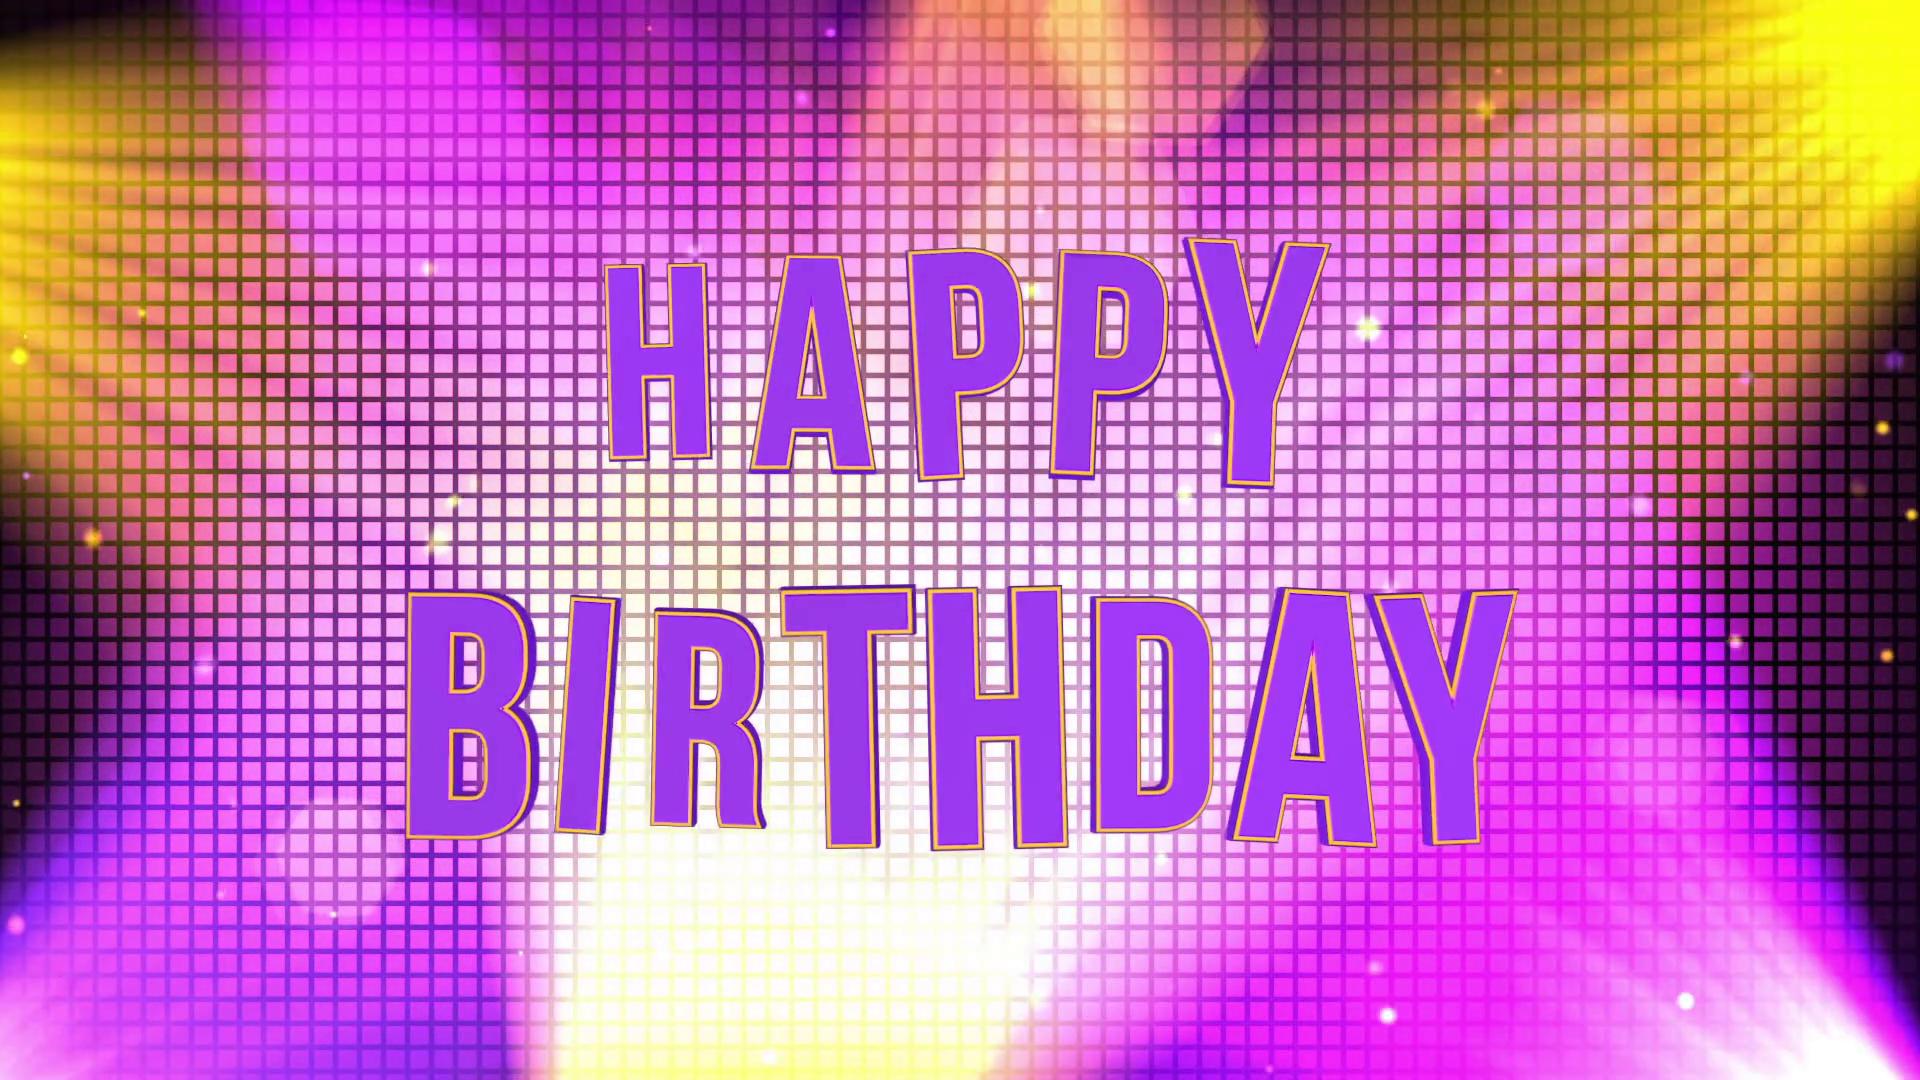 Video Happy Birthday 3d Animation - HD Wallpaper